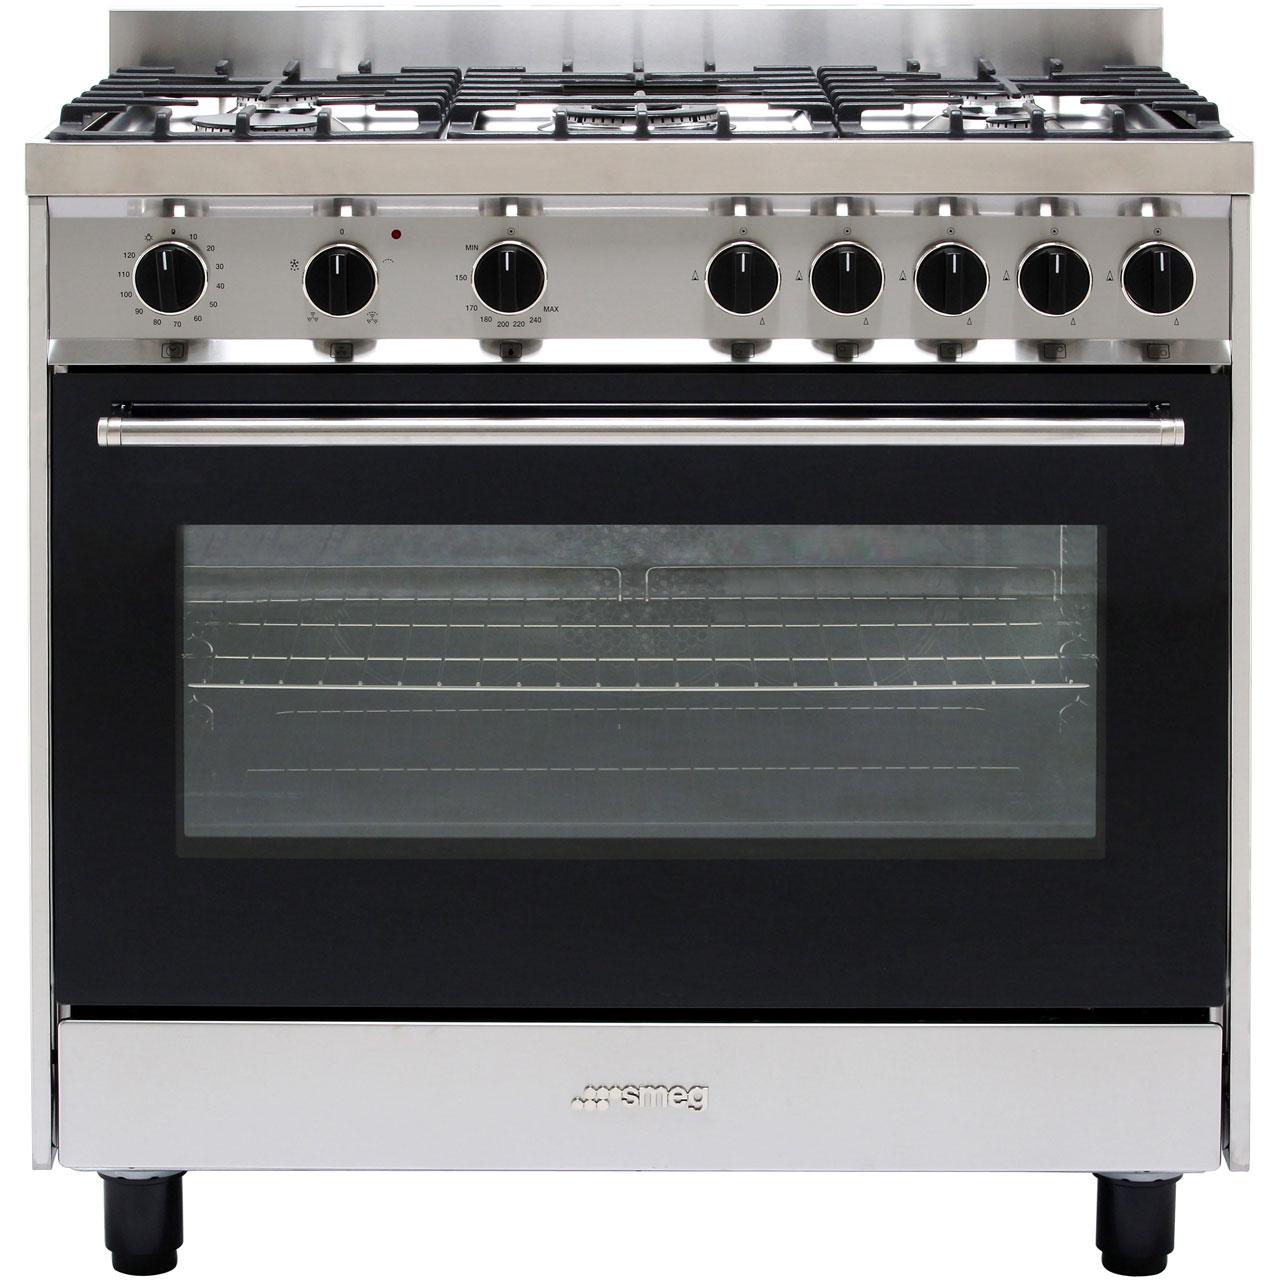 B90GVXI9_BSS | Smeg Range Cooker | ao.com